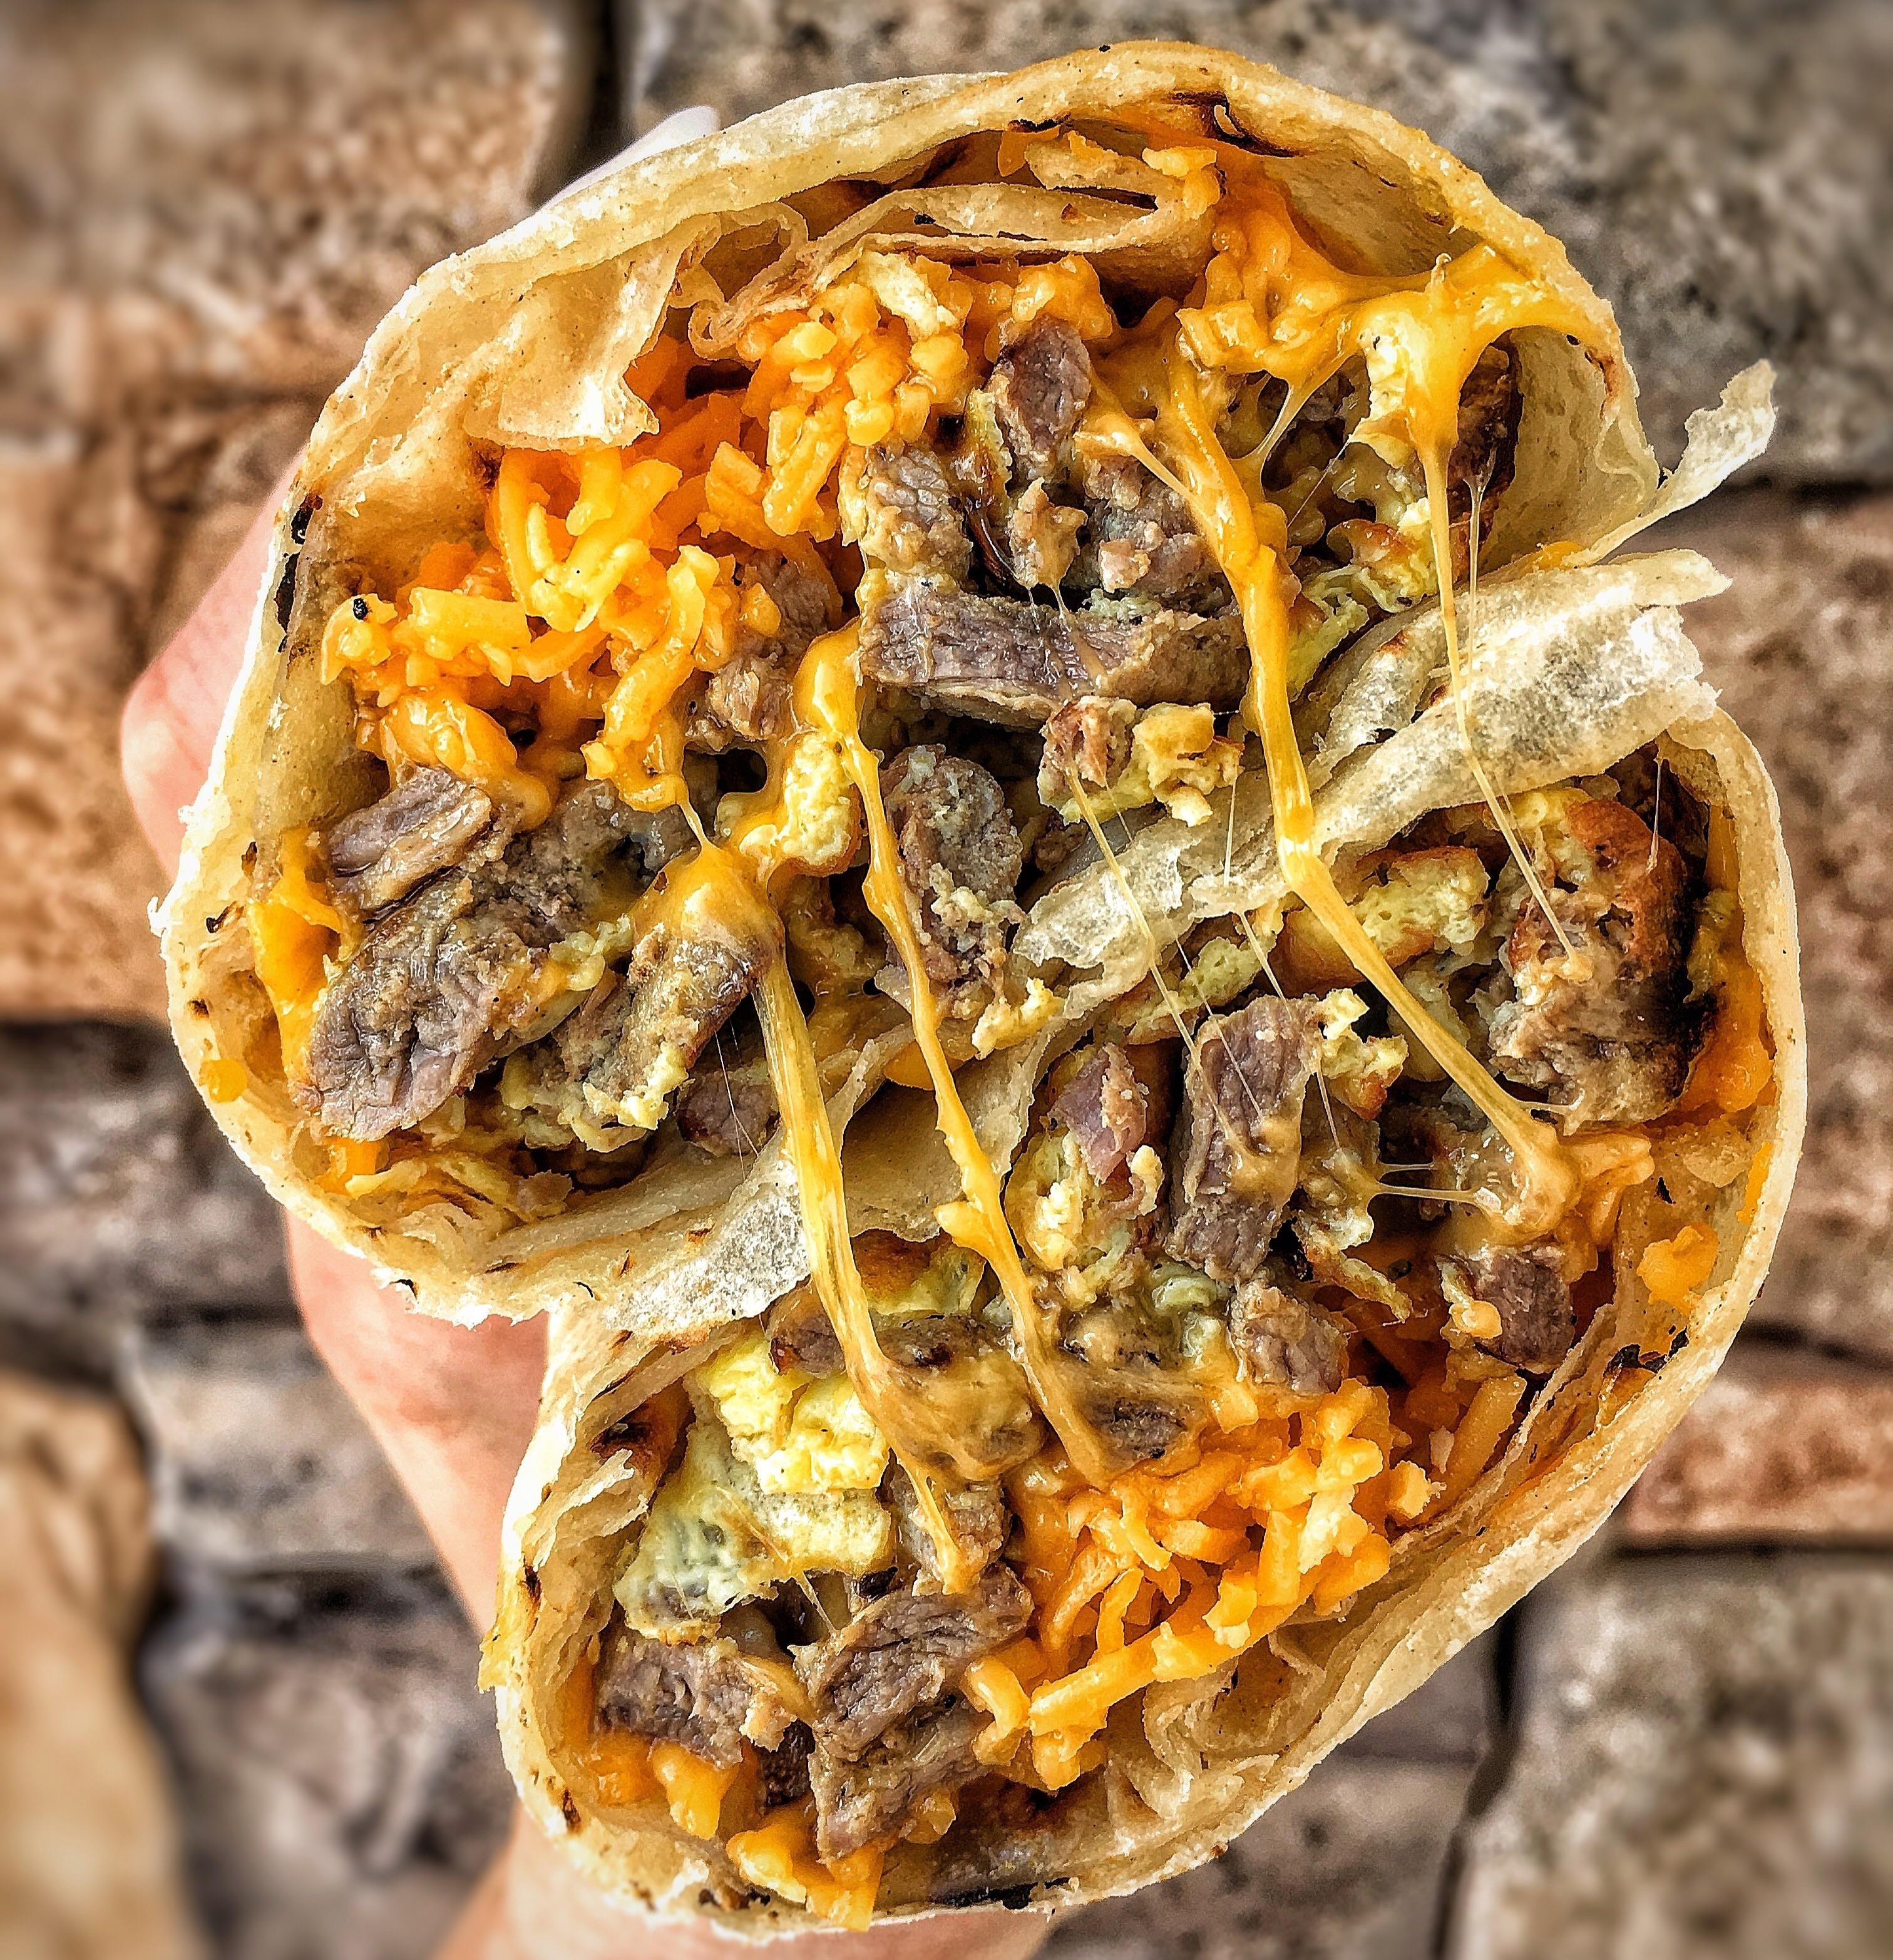 California Burrito Carne Asada Cheese Rice And Potatoes 3024x4032 Food California Food Mexican Food Recipes